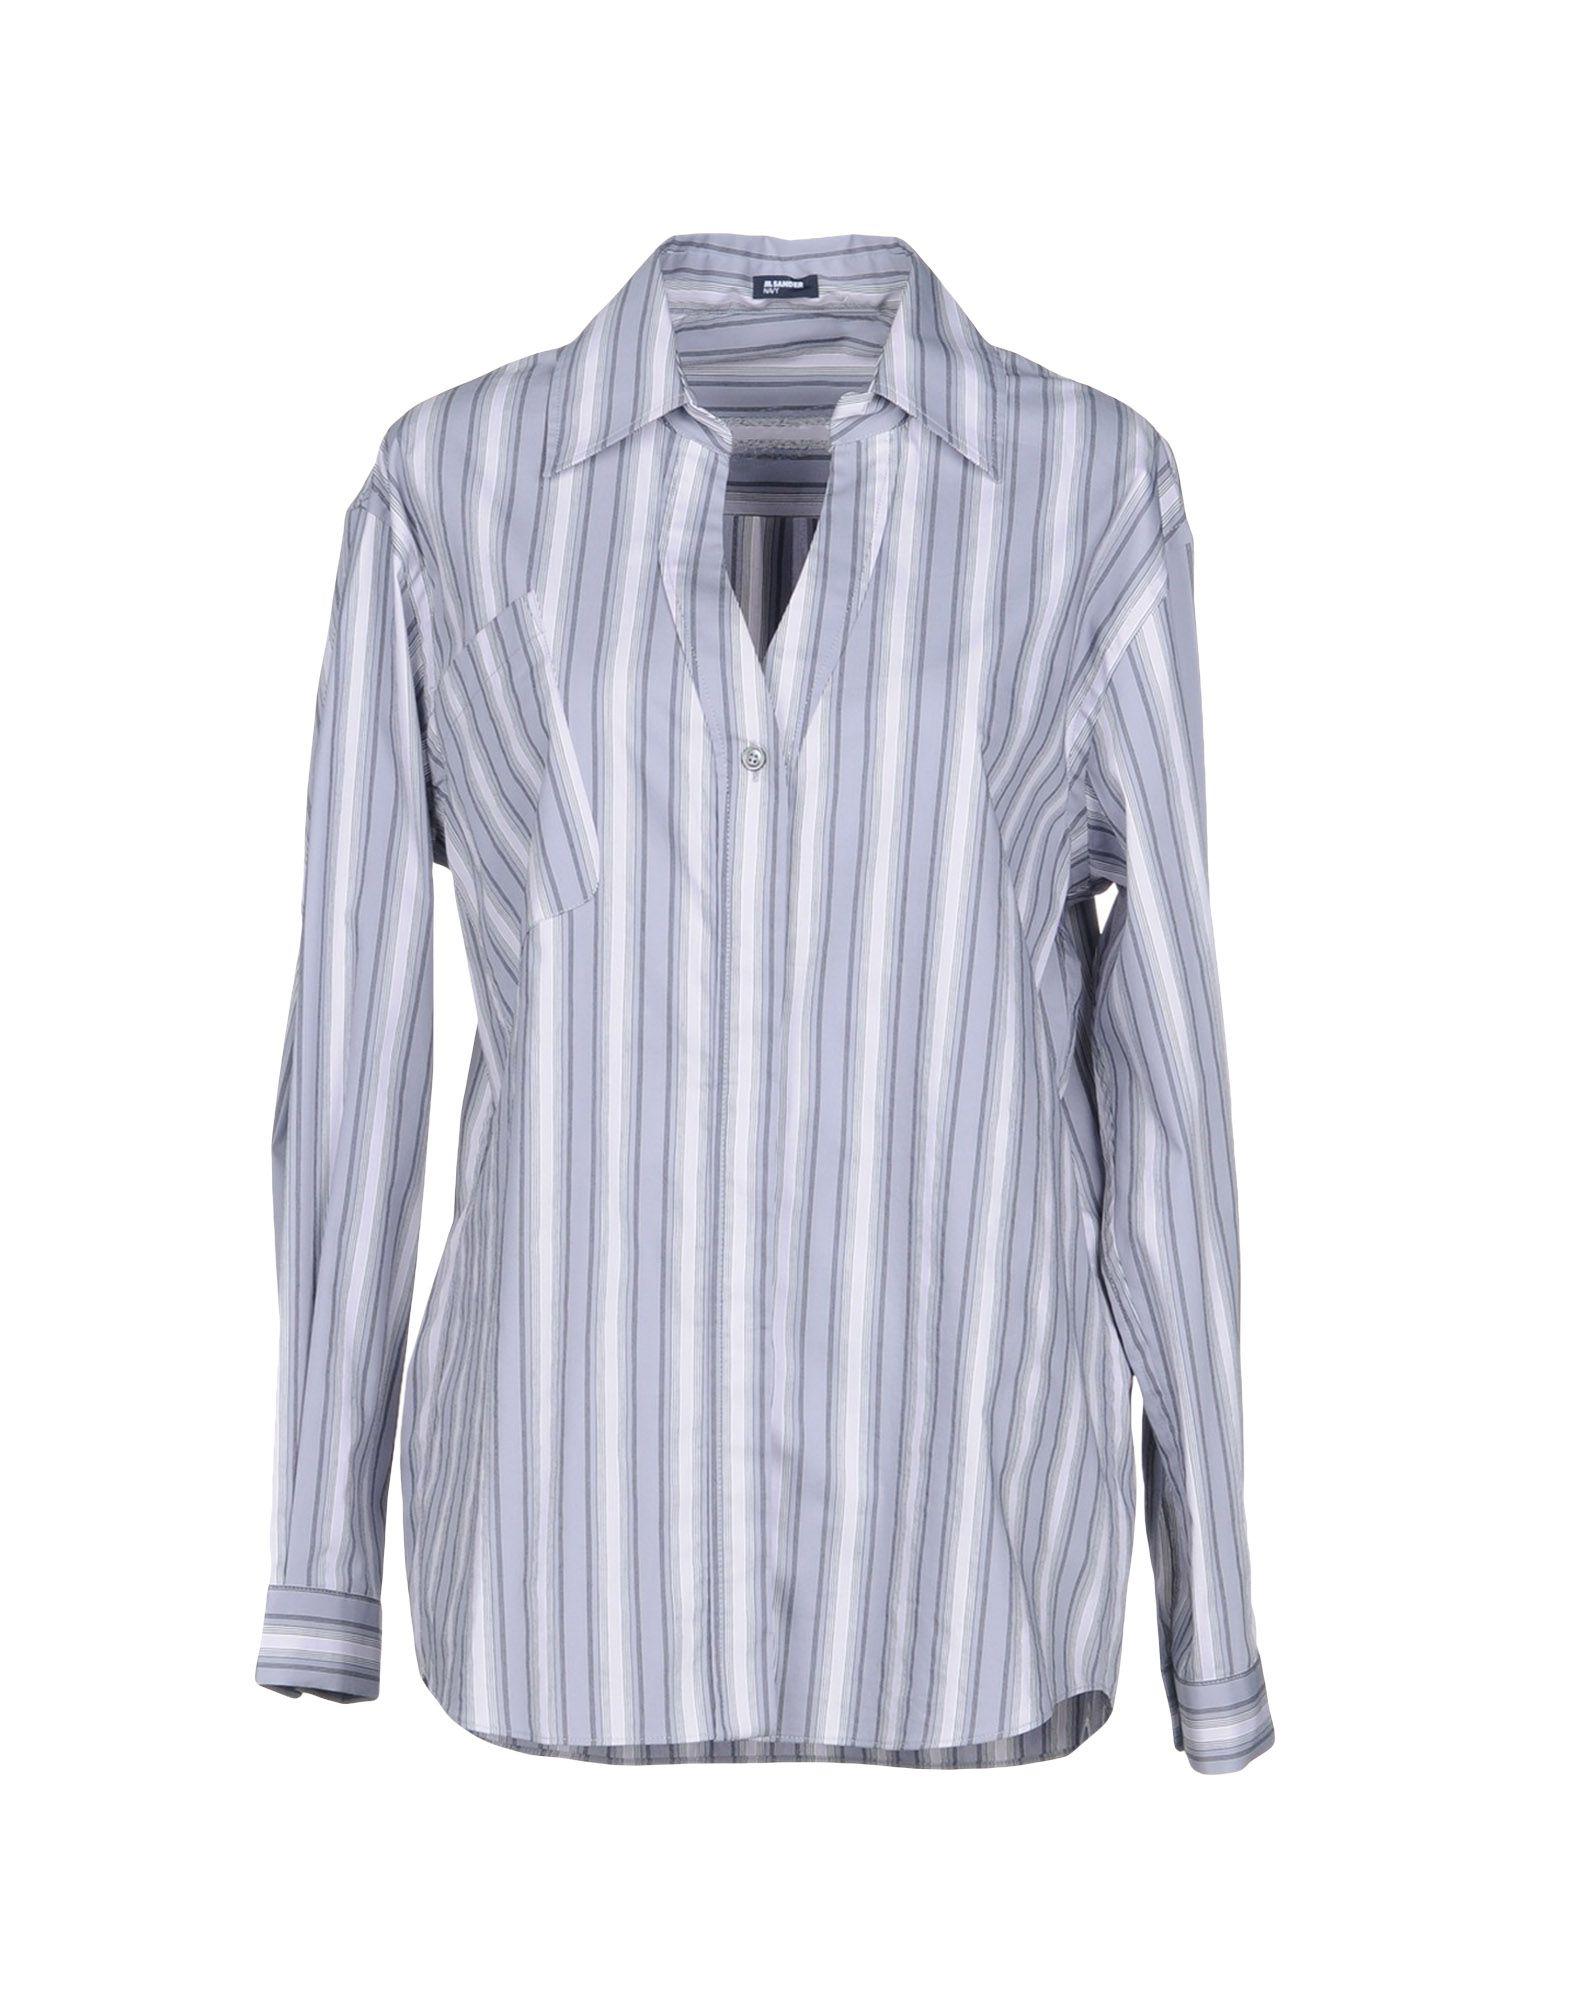 Camicia A Righe Jil Sander Navy Donna - Acquista online su D6QnQnif